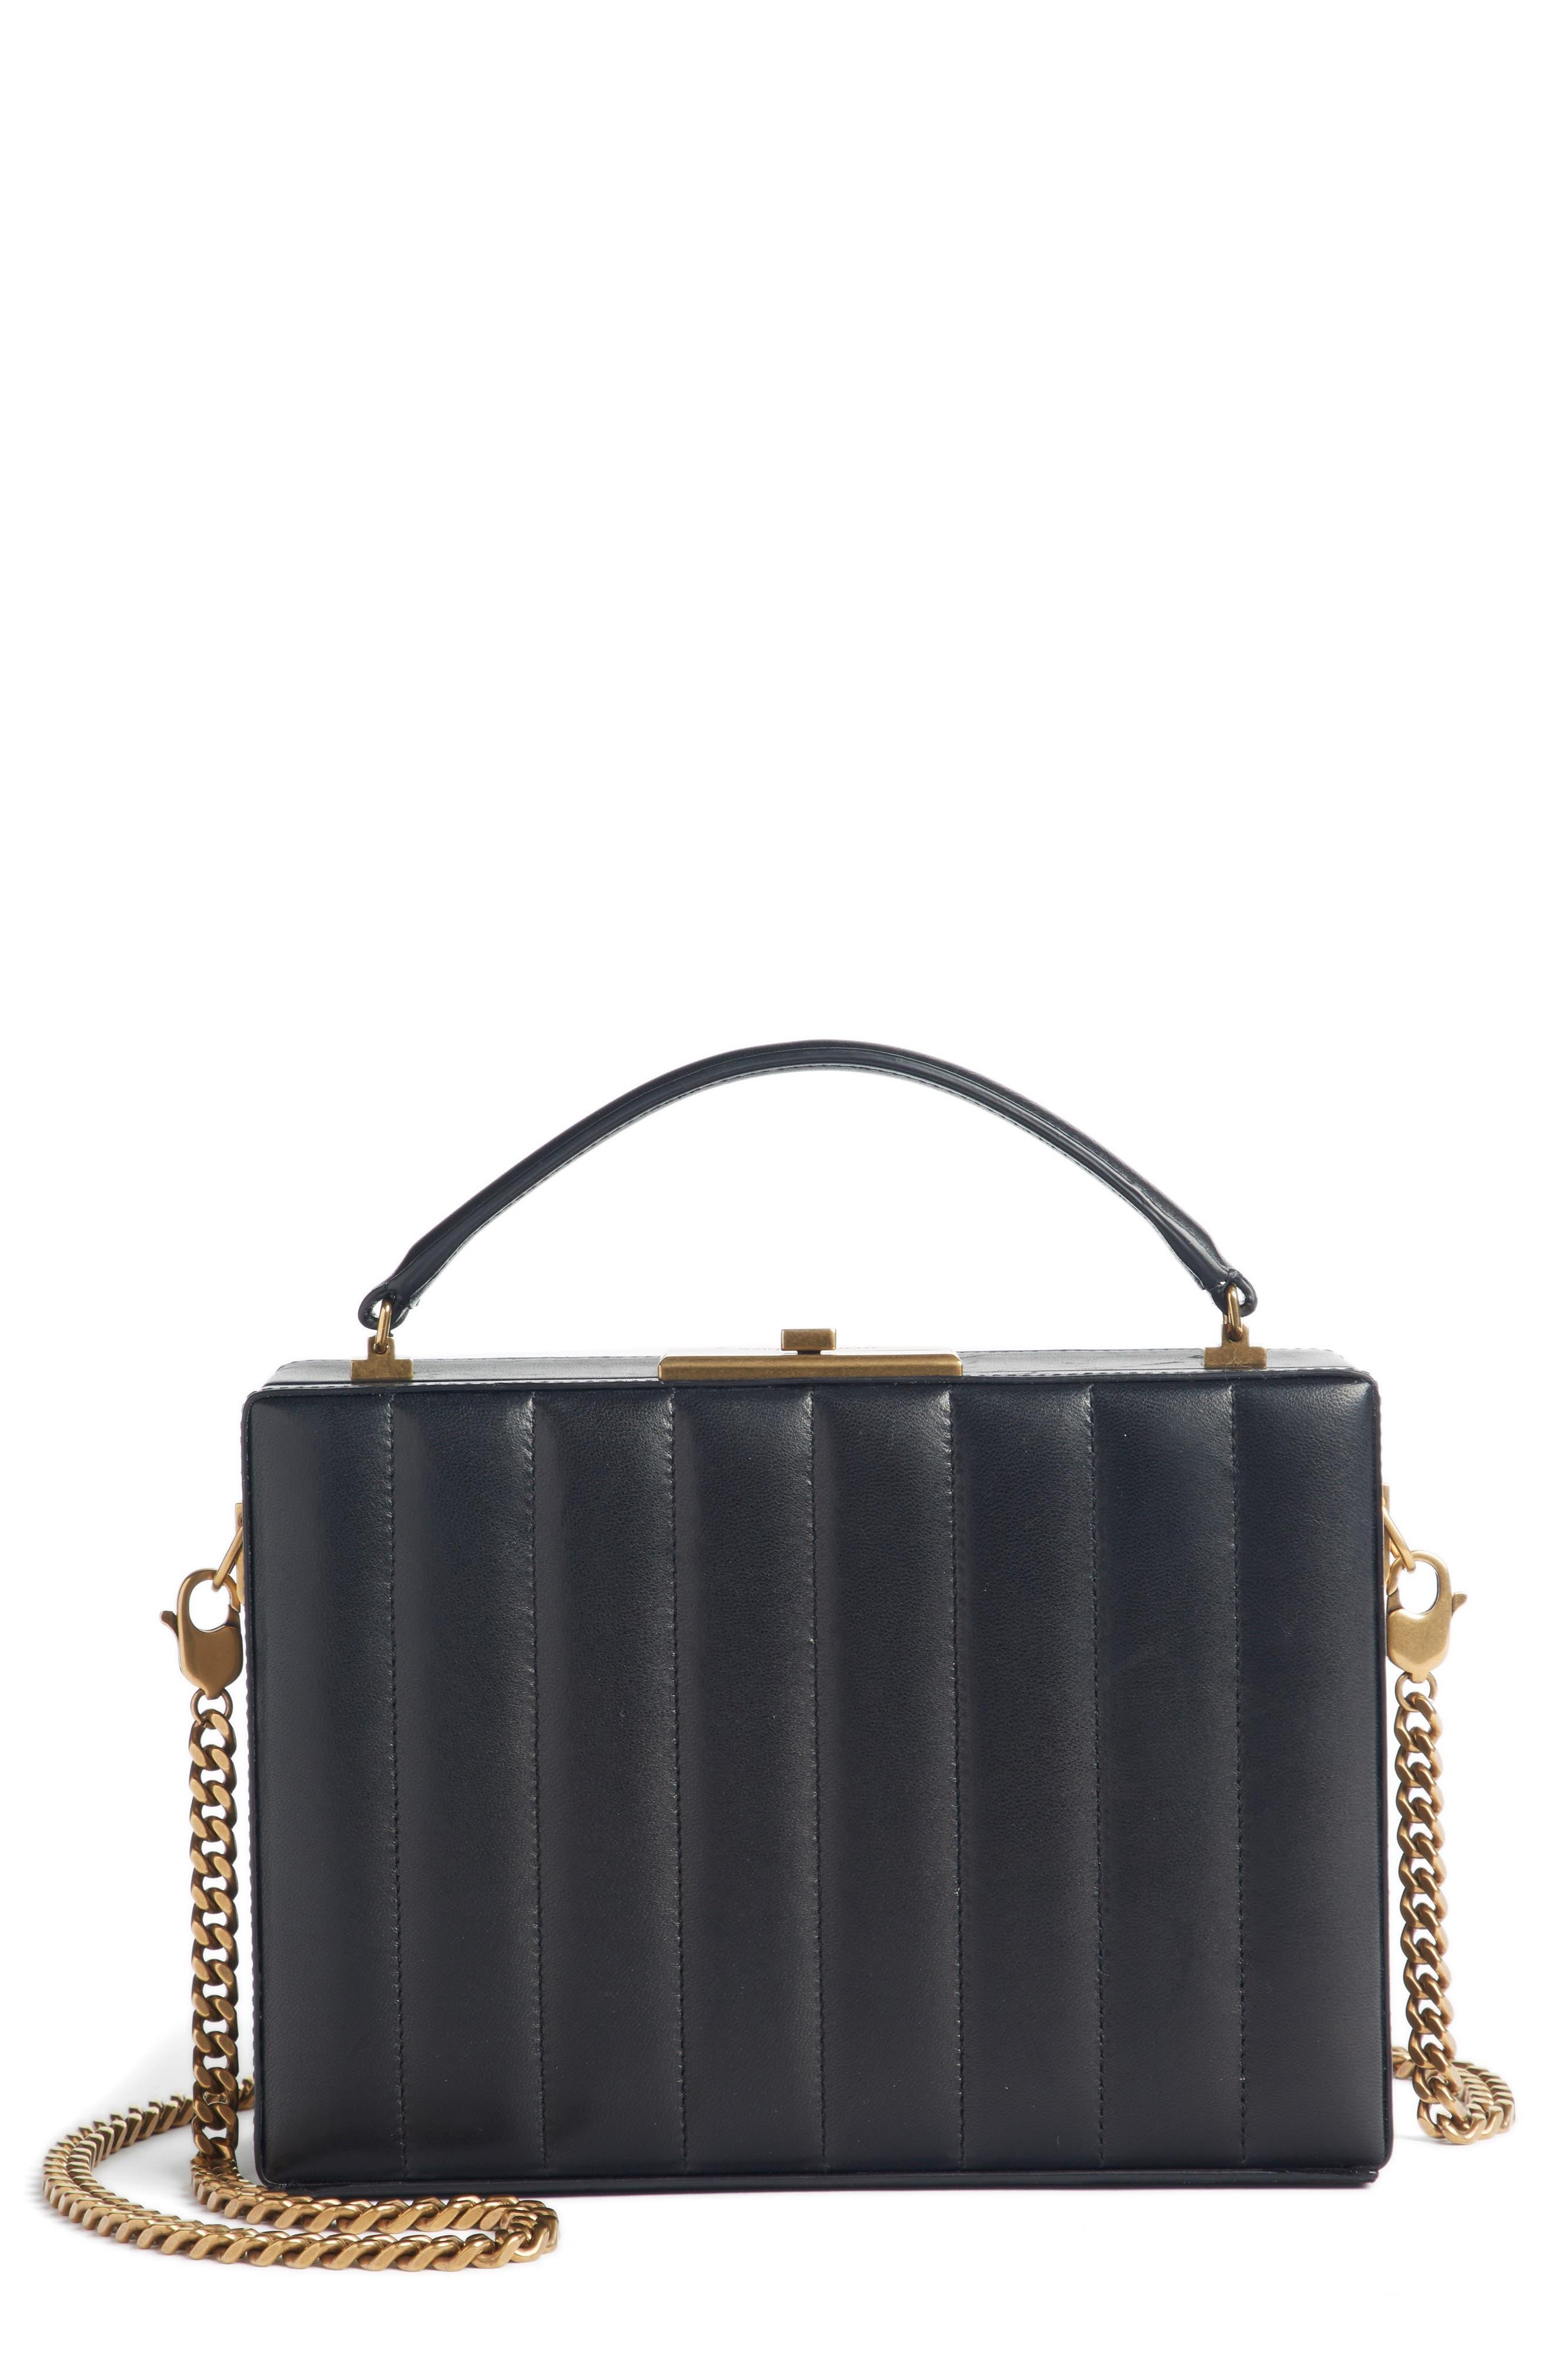 Nan Quilted Leather Frame Bag, Main, color, NOIR